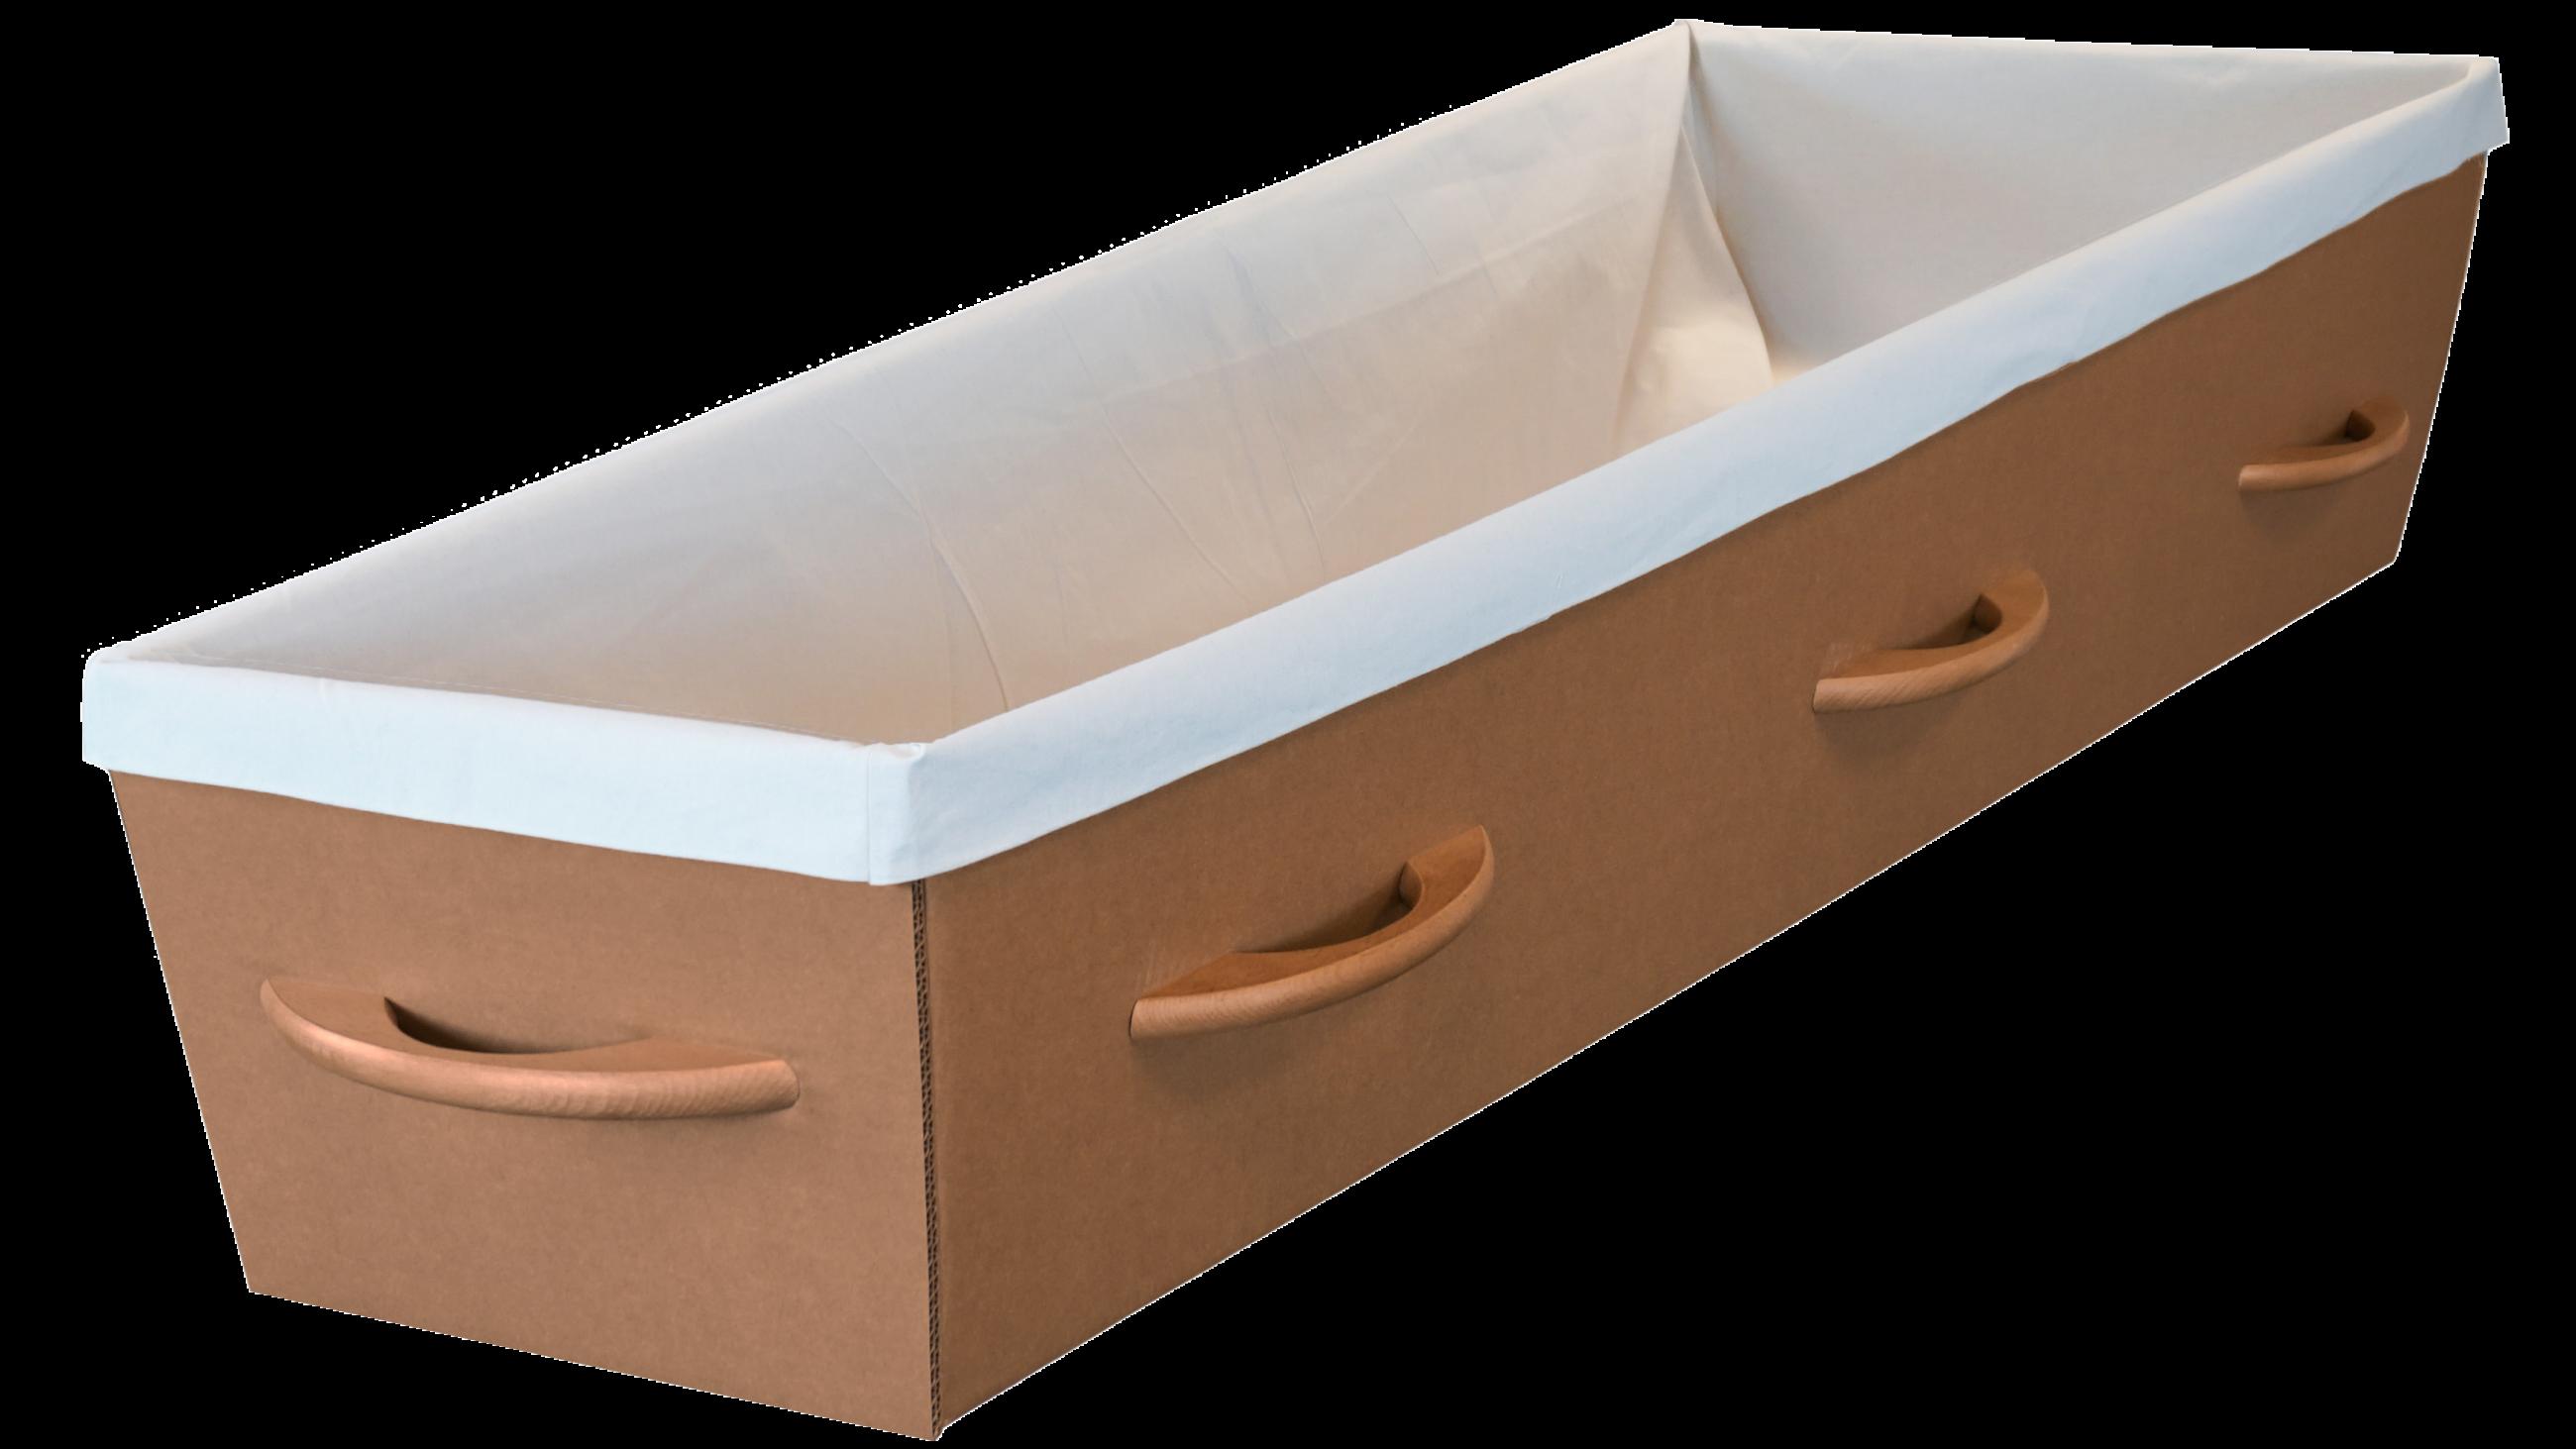 FAIR coffins uit Nijmegen wint de Dutch Funeral Awards